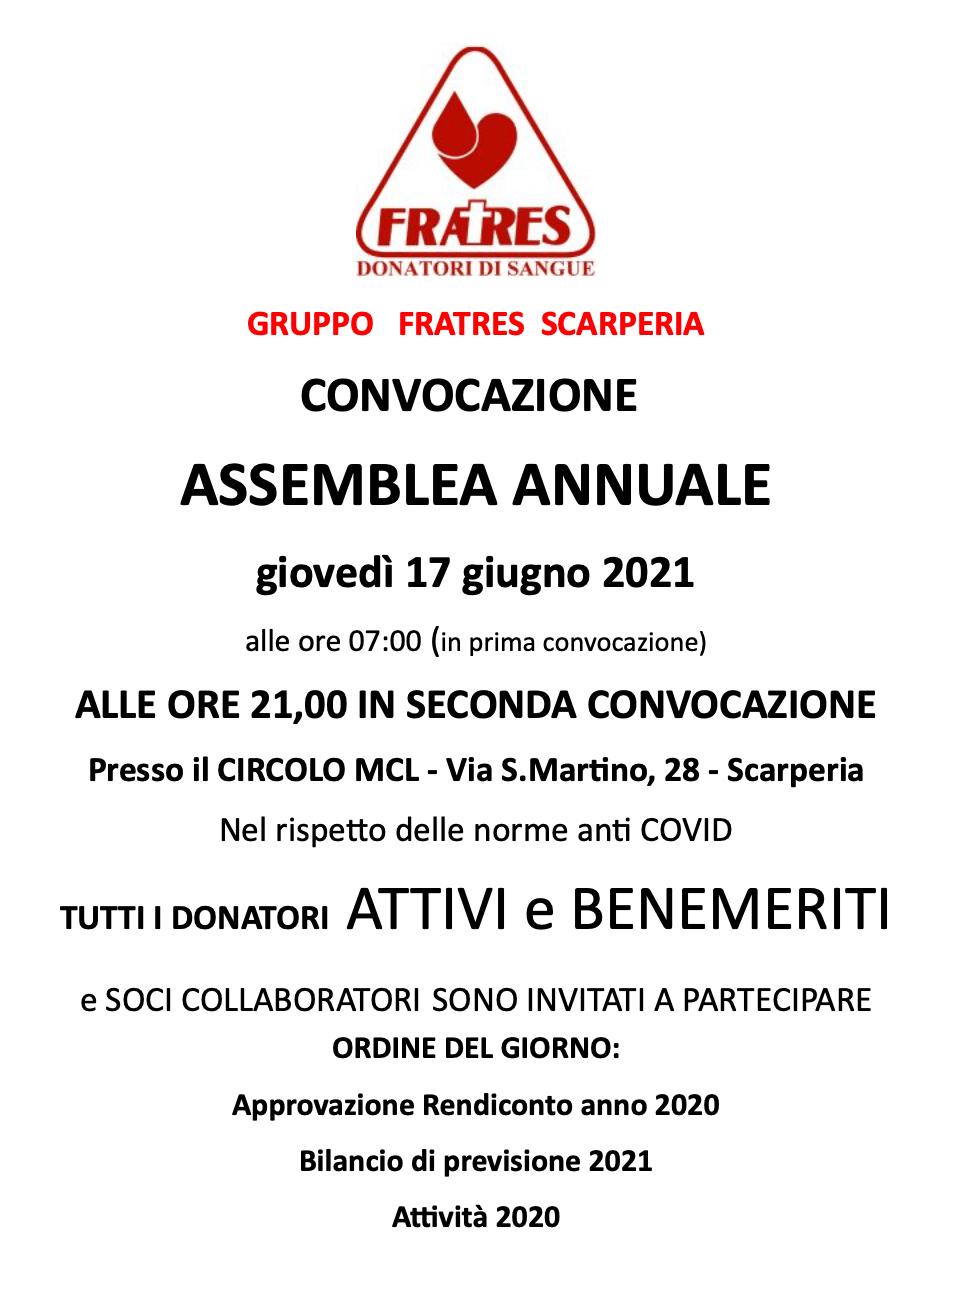 Fratres Assemblea annuale 2021